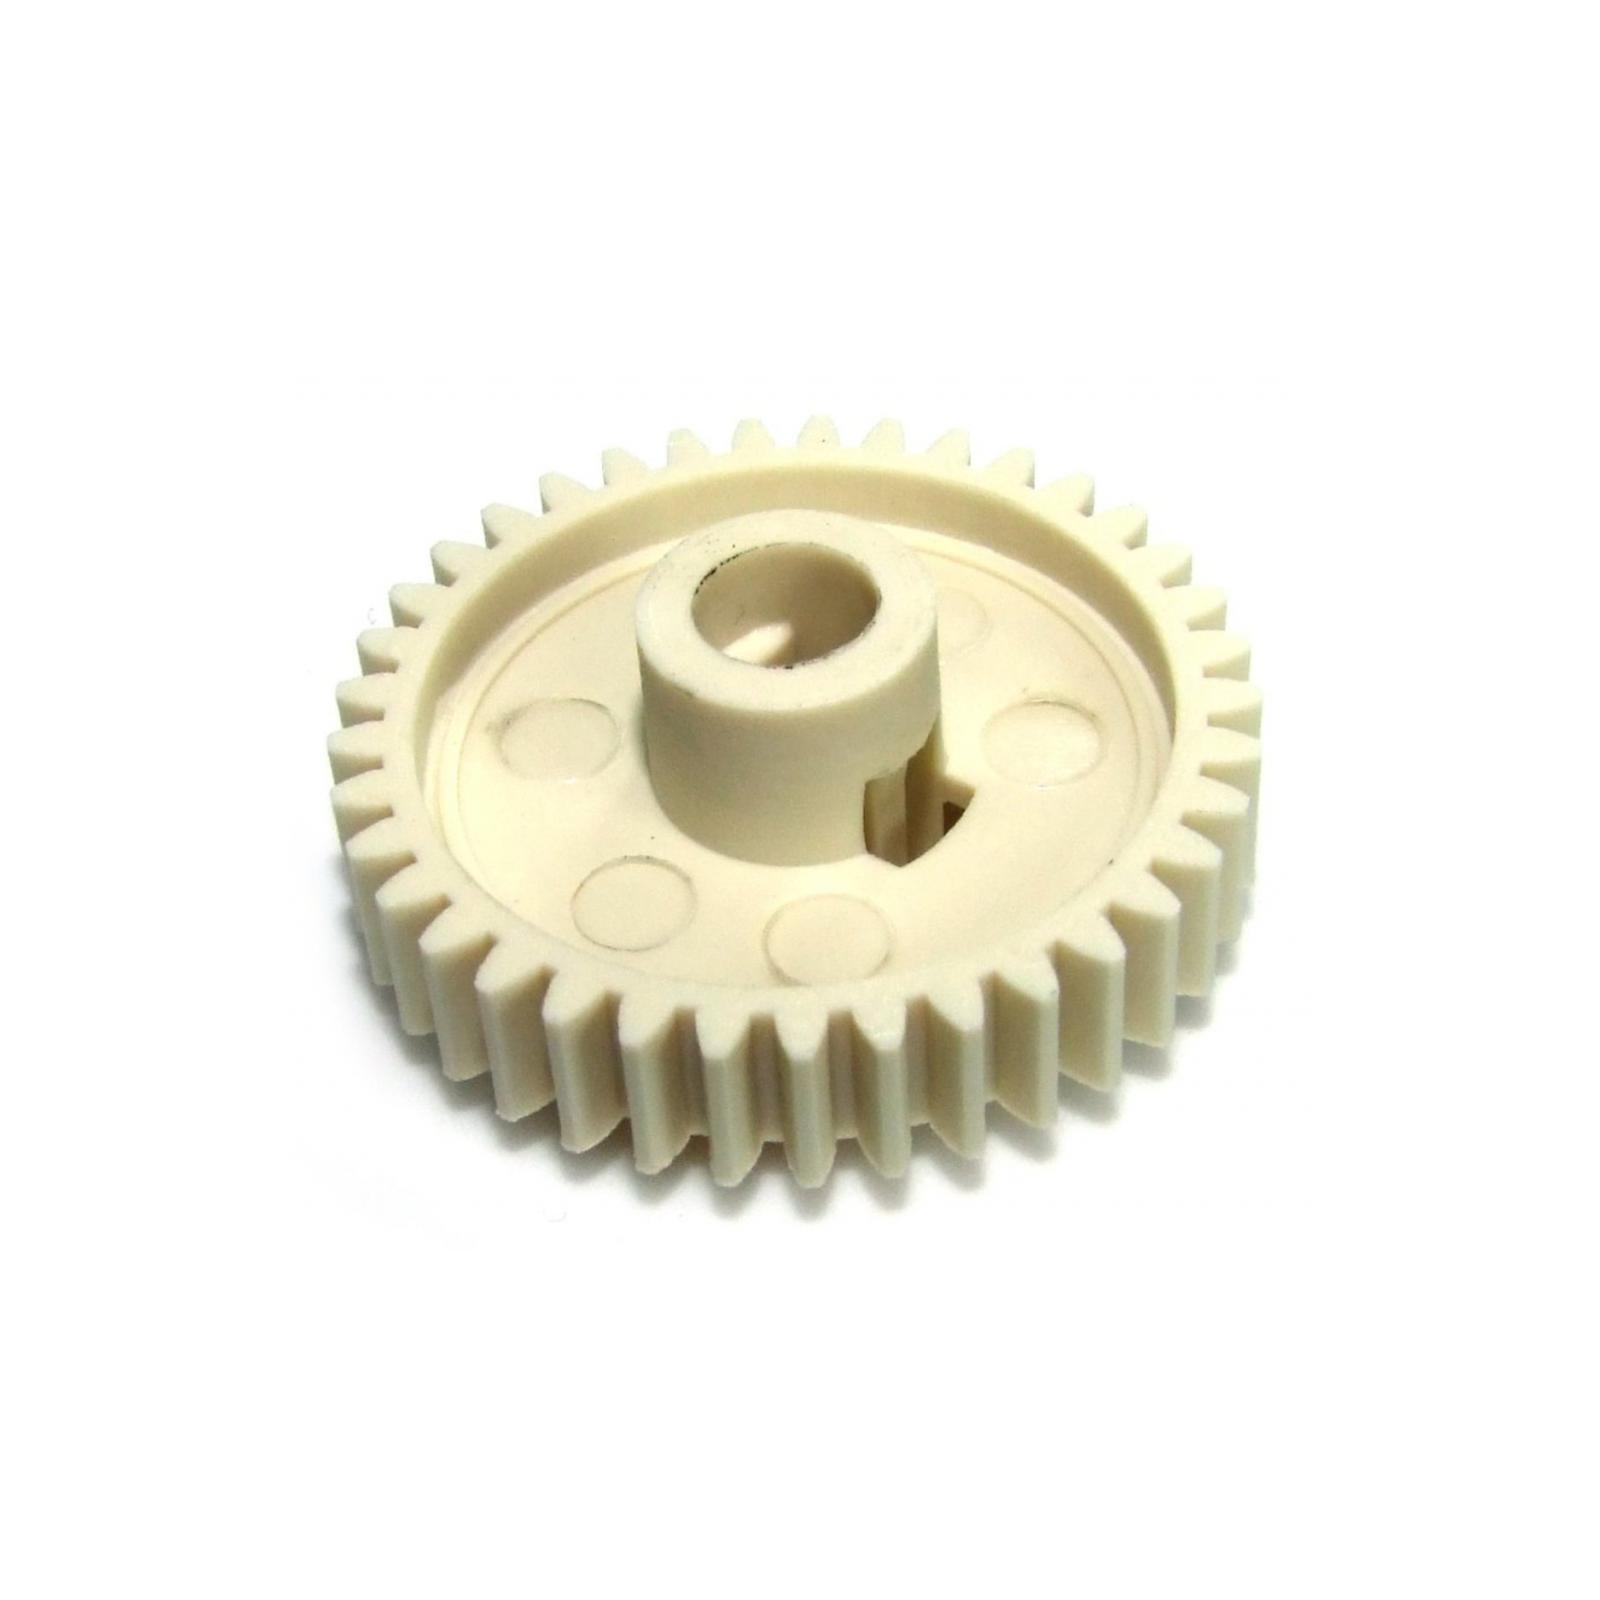 Шестерня узла закрепления HP LJ 1022/1018 аналог RU5-0523-000 АНК (20620)